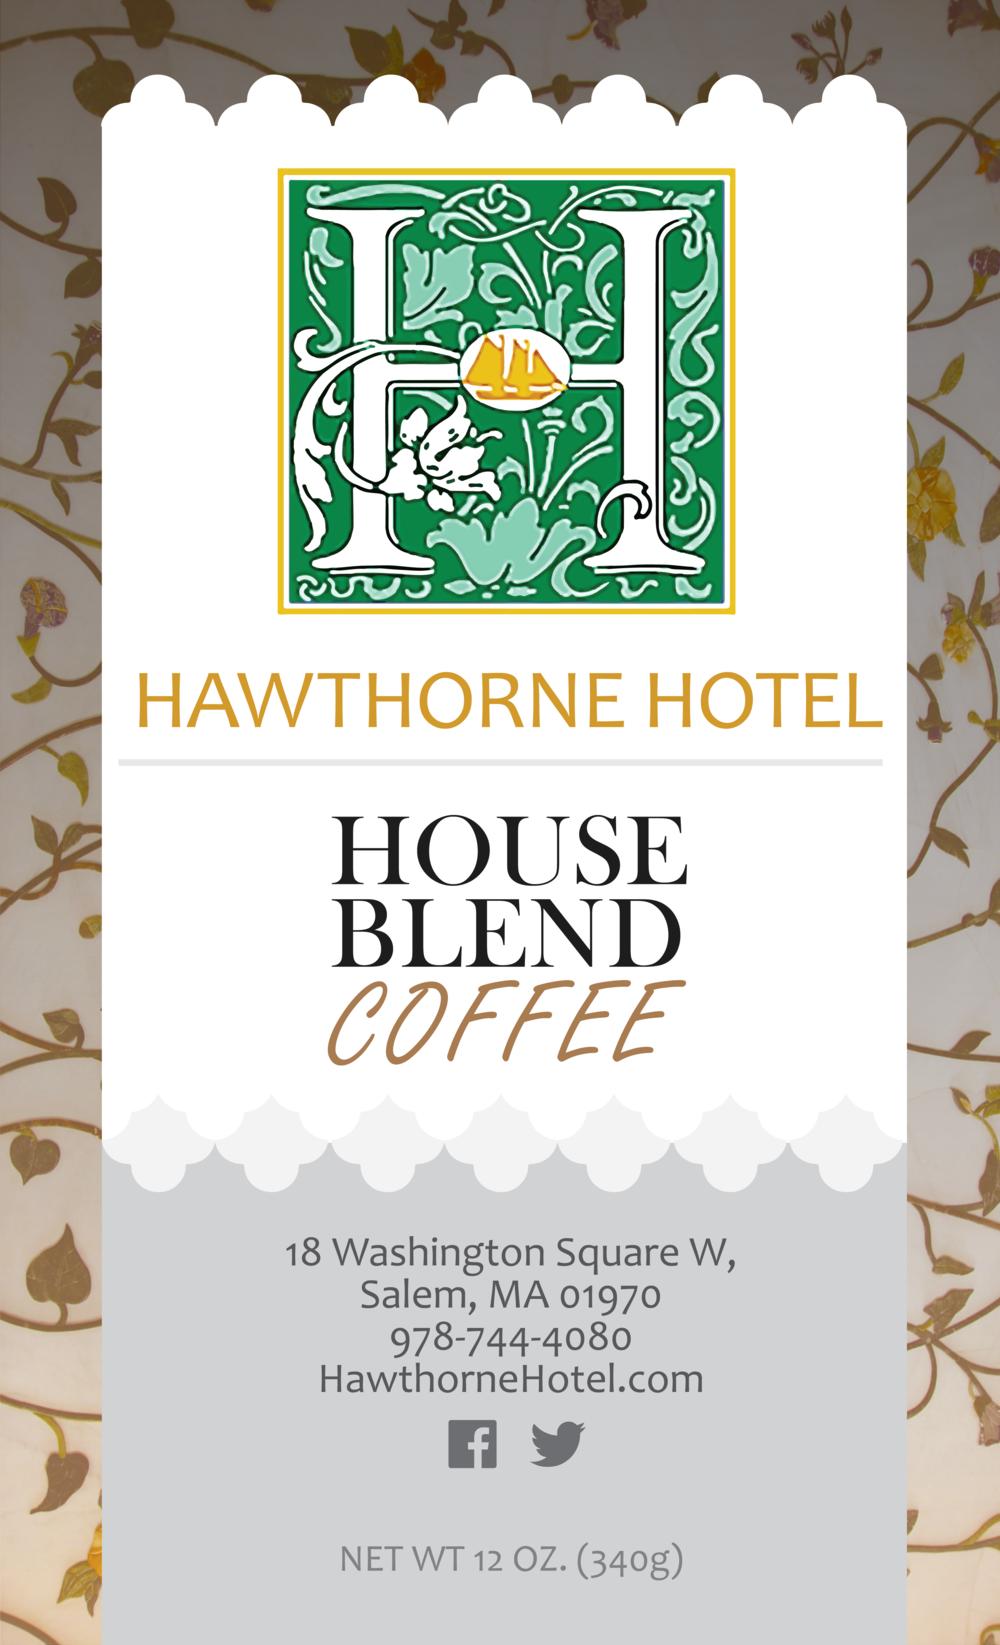 Hawthorne Hotel-01.png